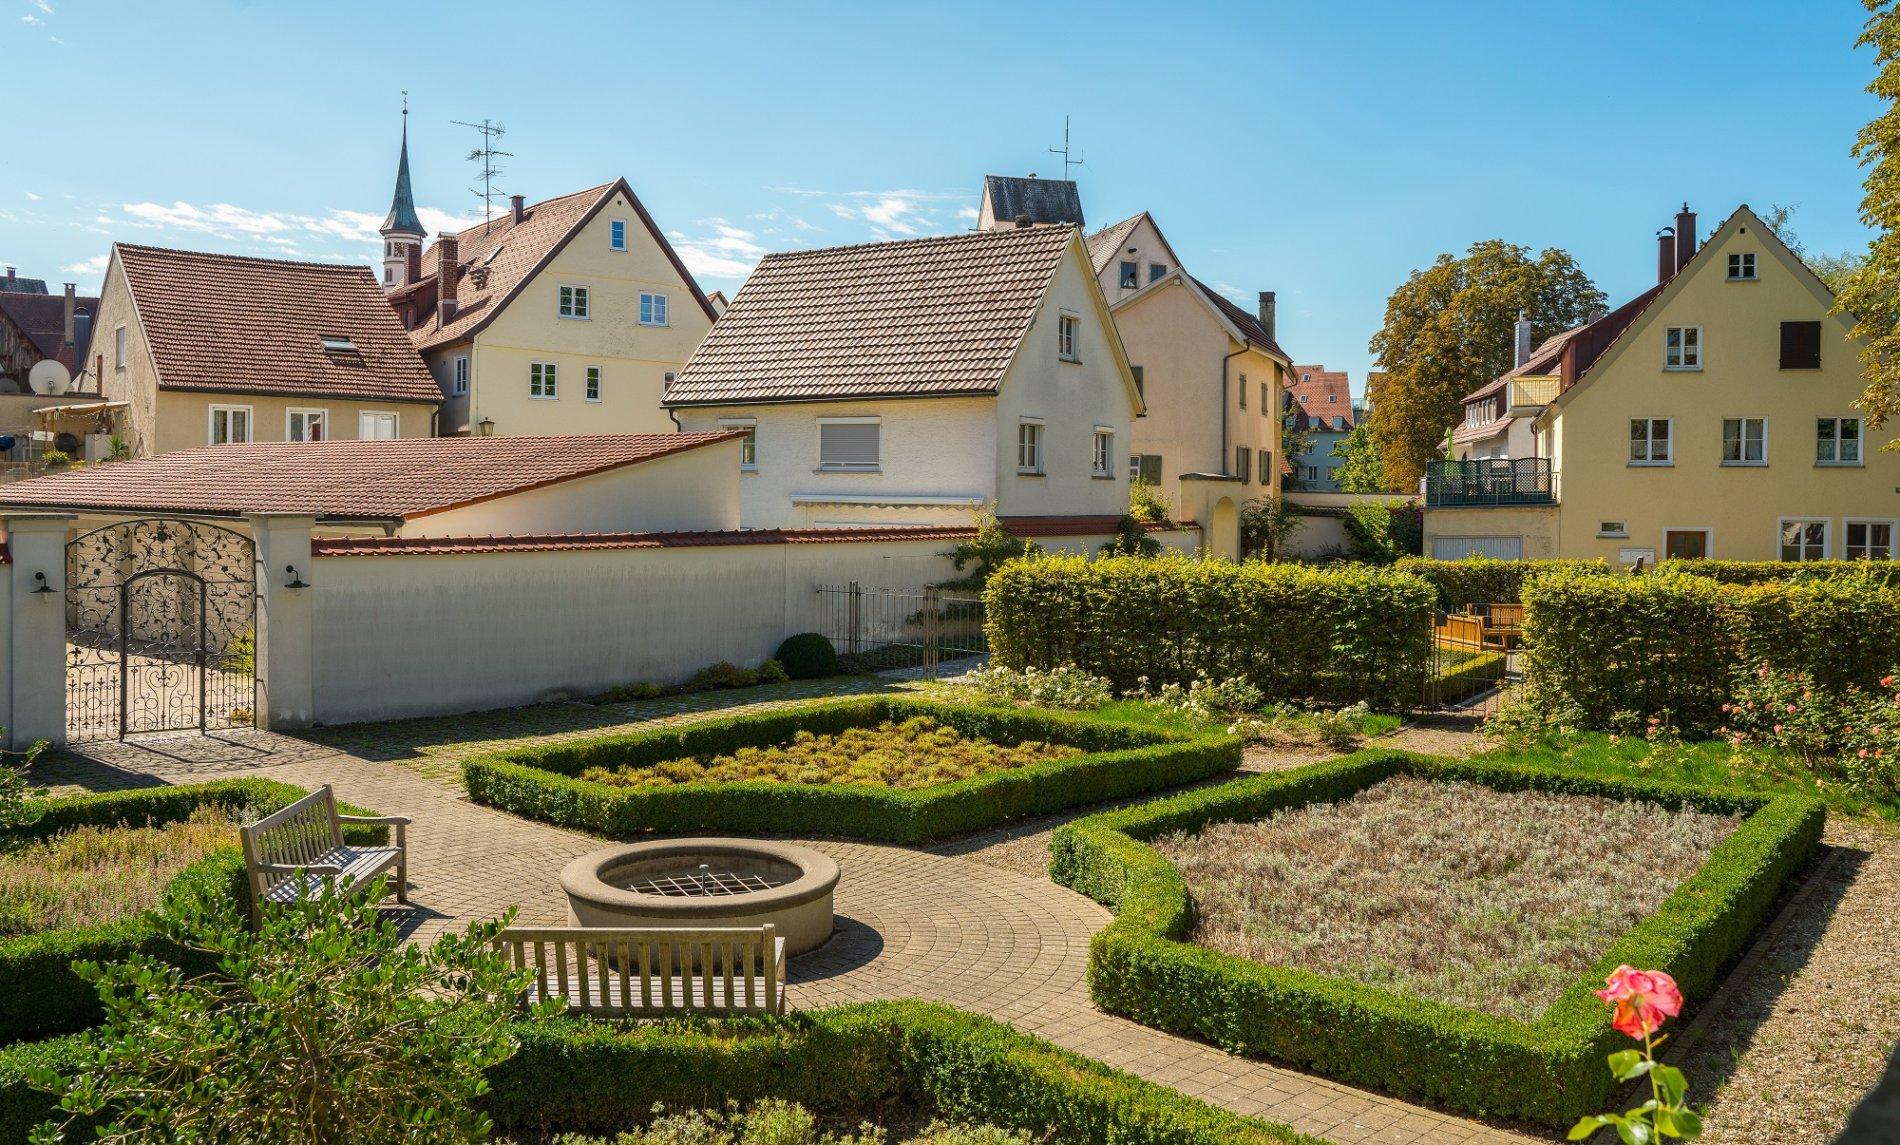 Garten des Stadtschlosses